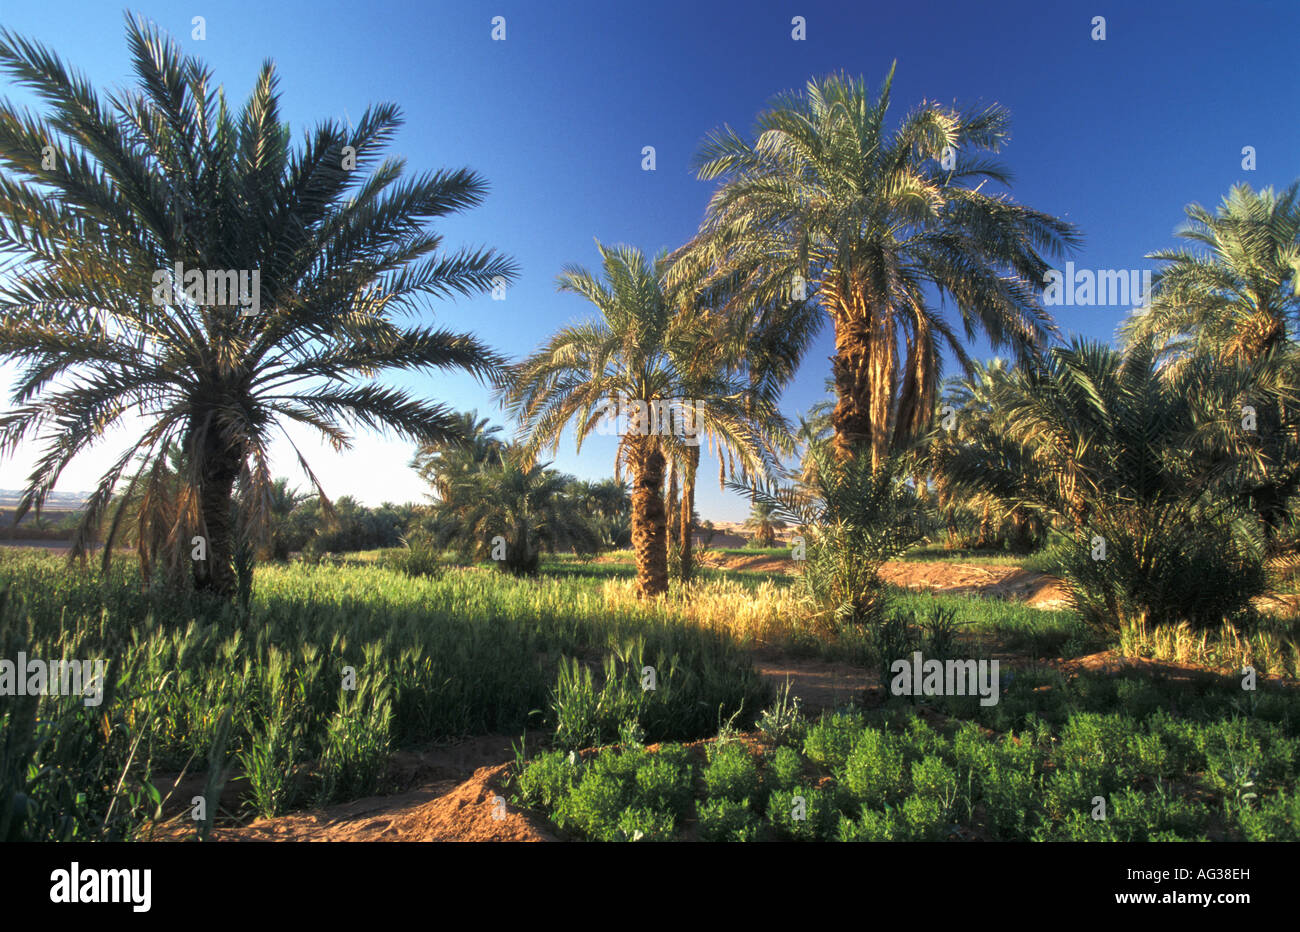 Algeria Timimoun Date palm tree in oasis - Stock Image